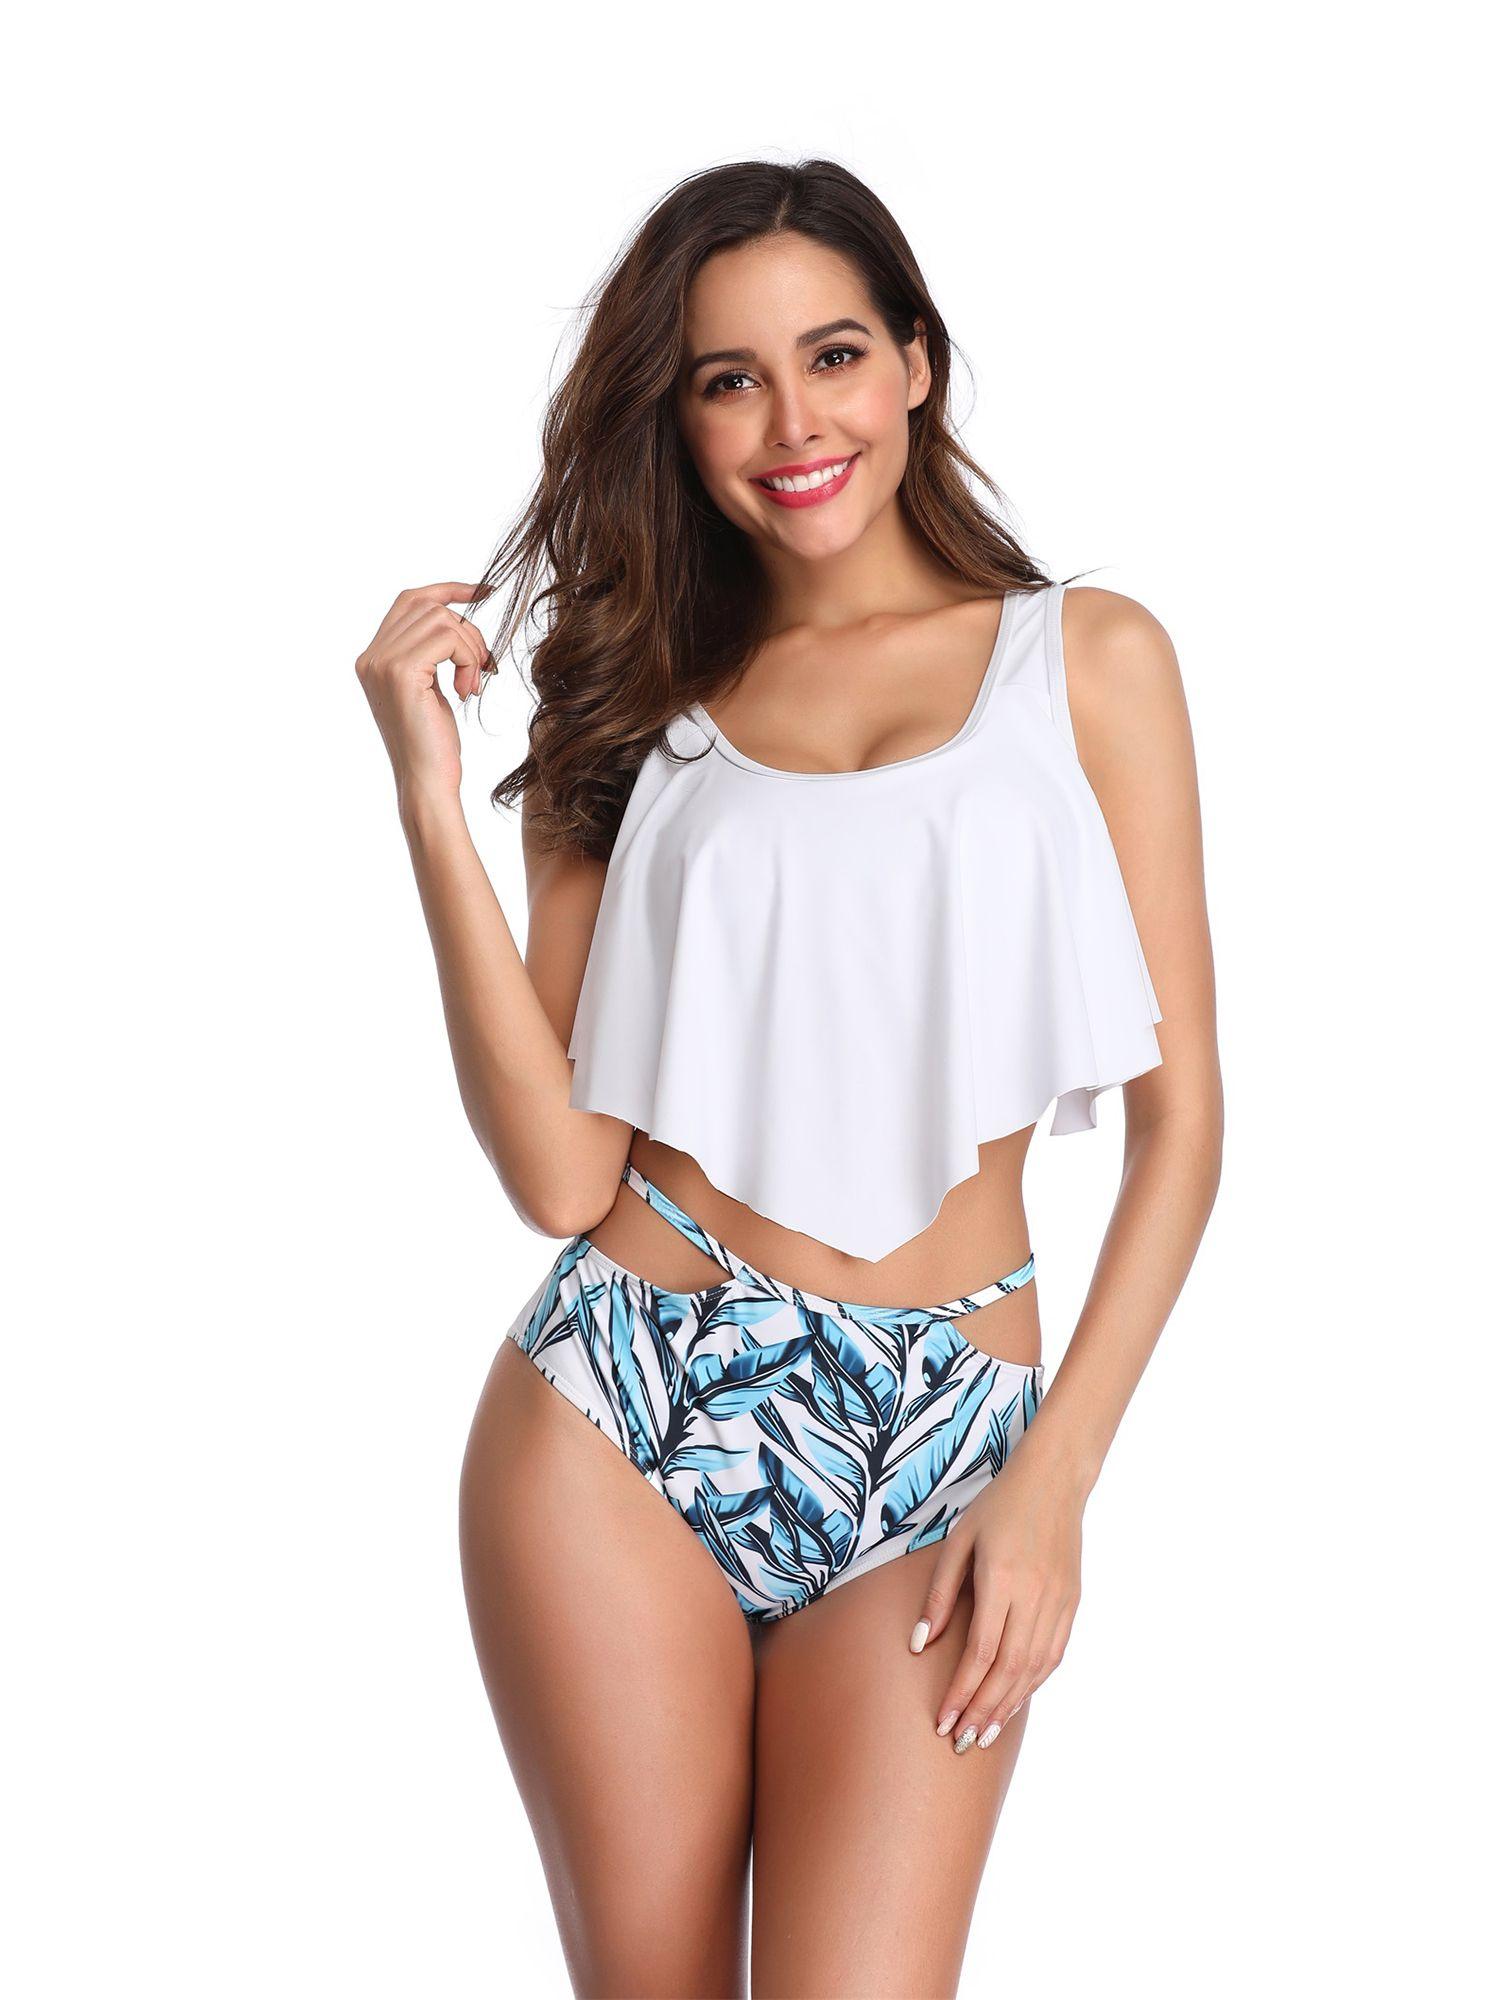 39e3aa76b9e79 Women Swimsuit Swimwear Beachwear Tankini Sets Tummy Control Backless High  Waist Bikini Push Up Bra Padded